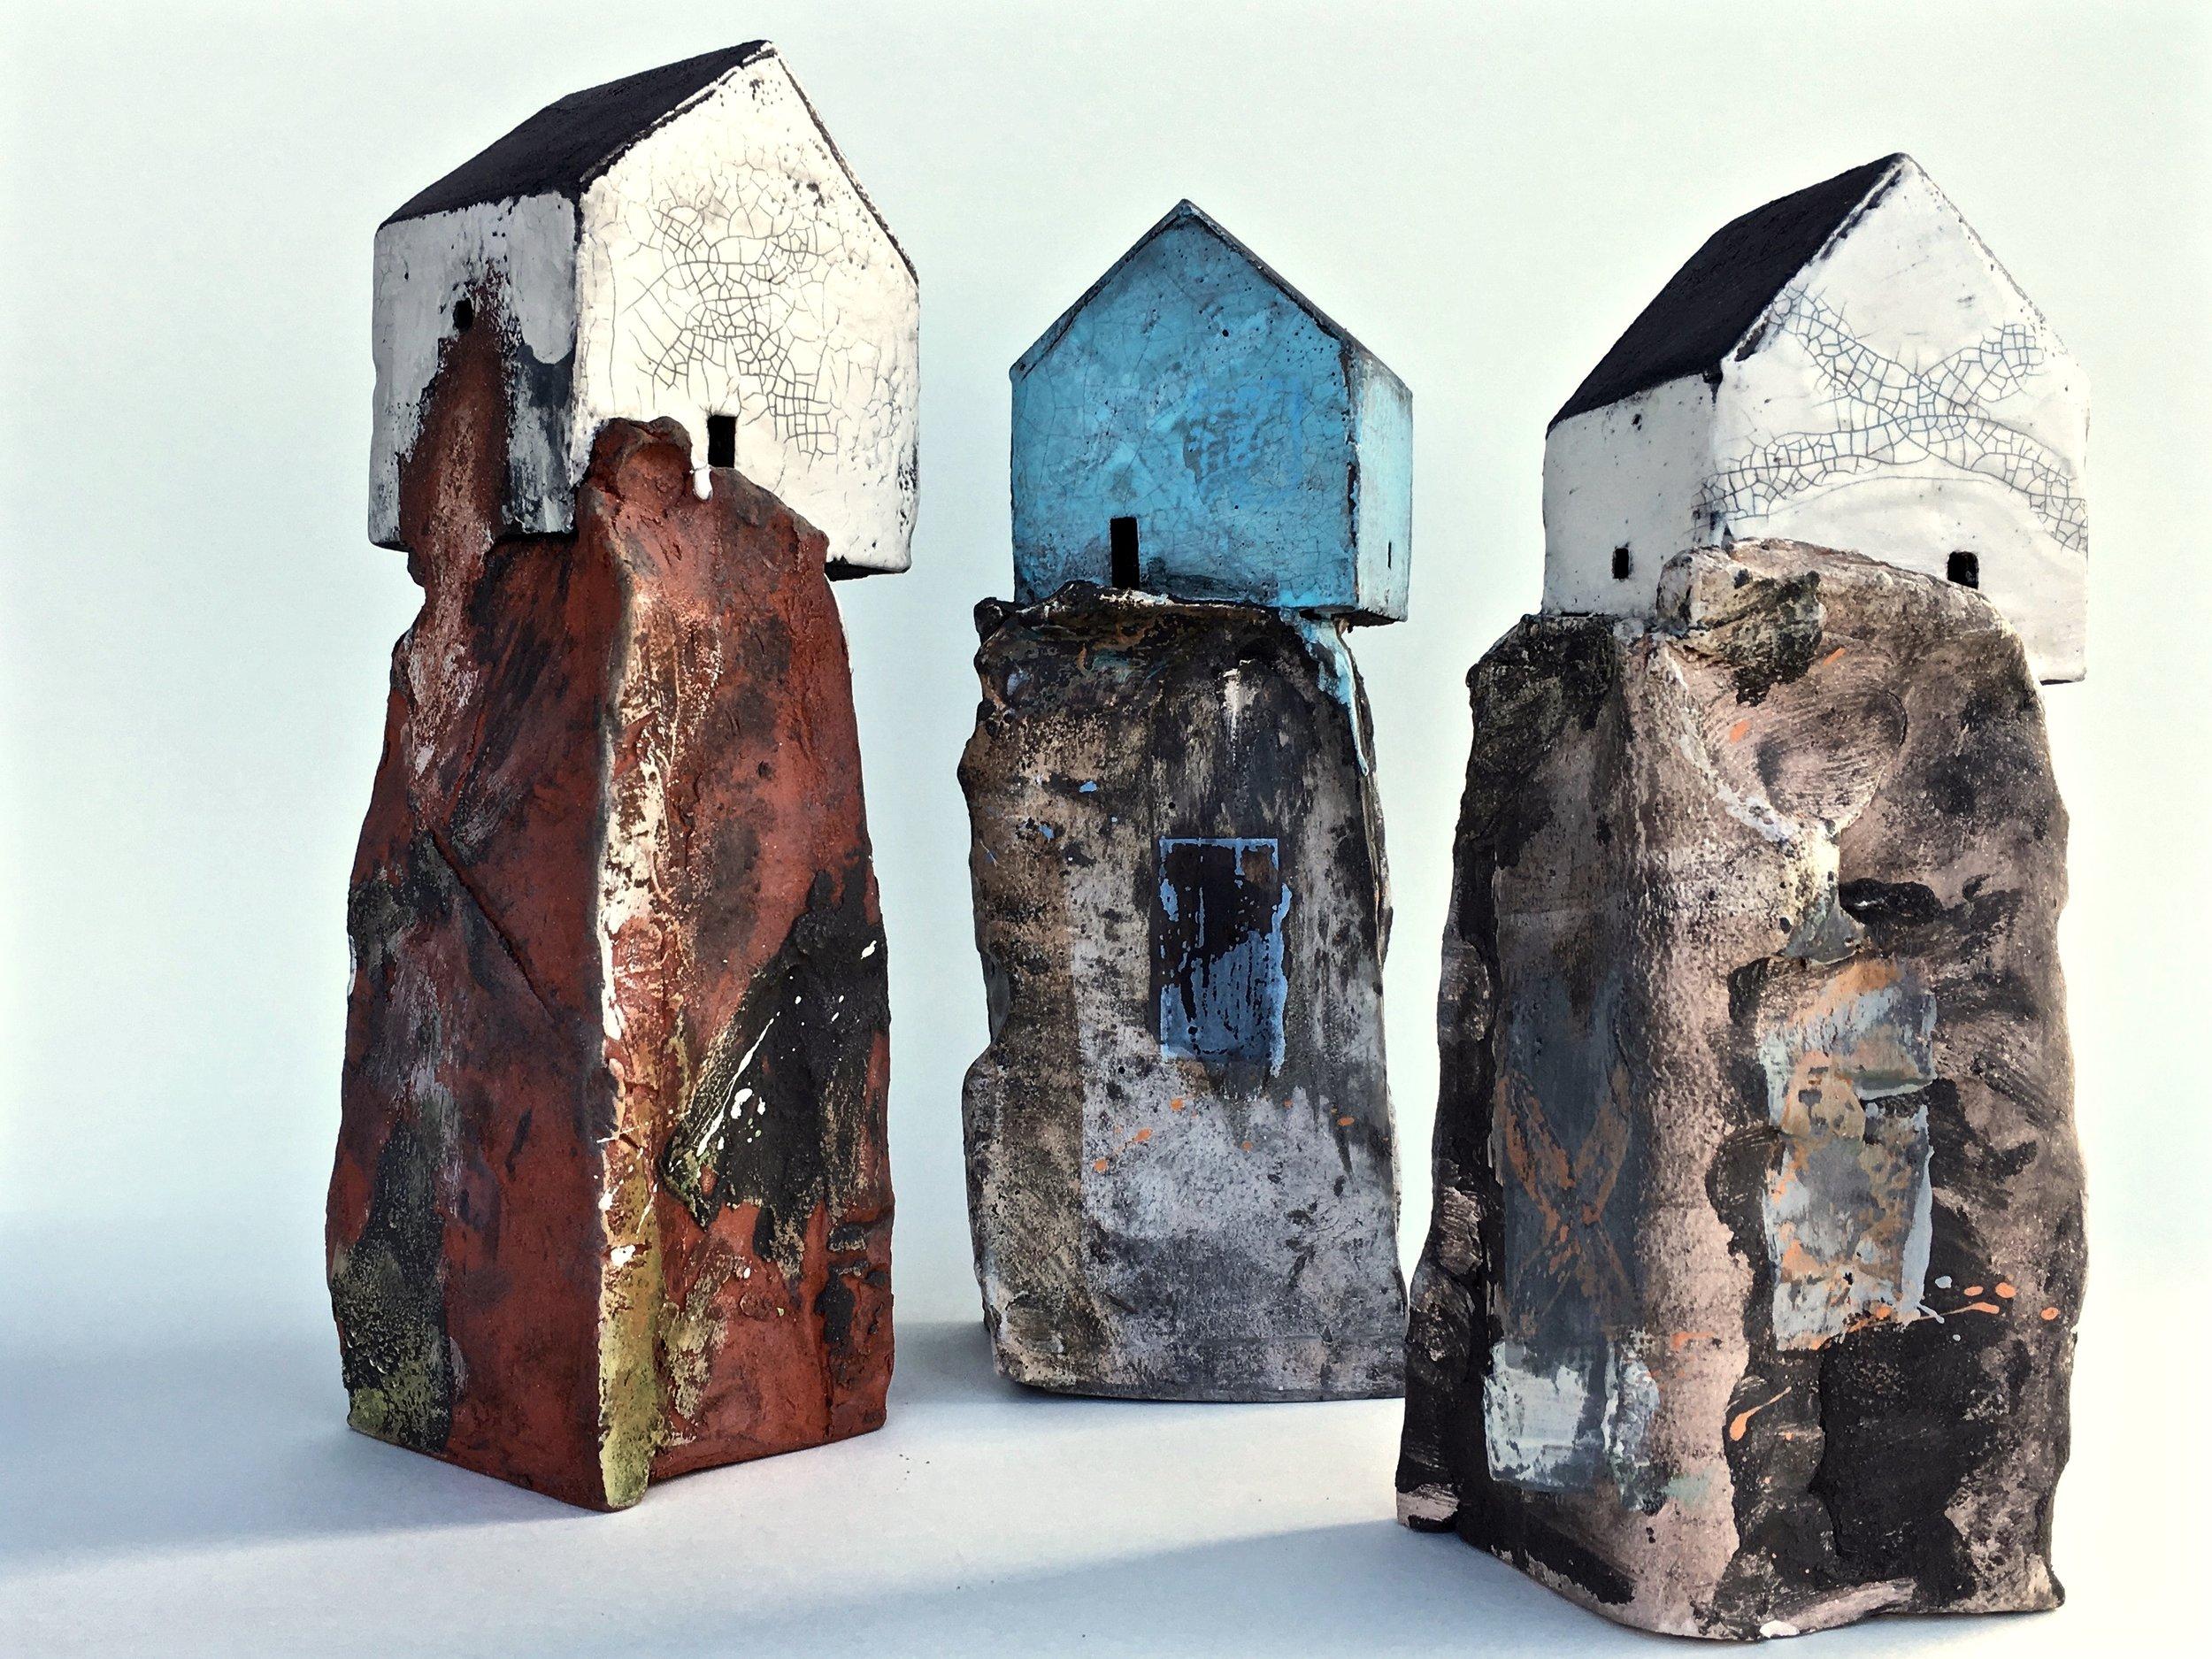 Houses on rocks